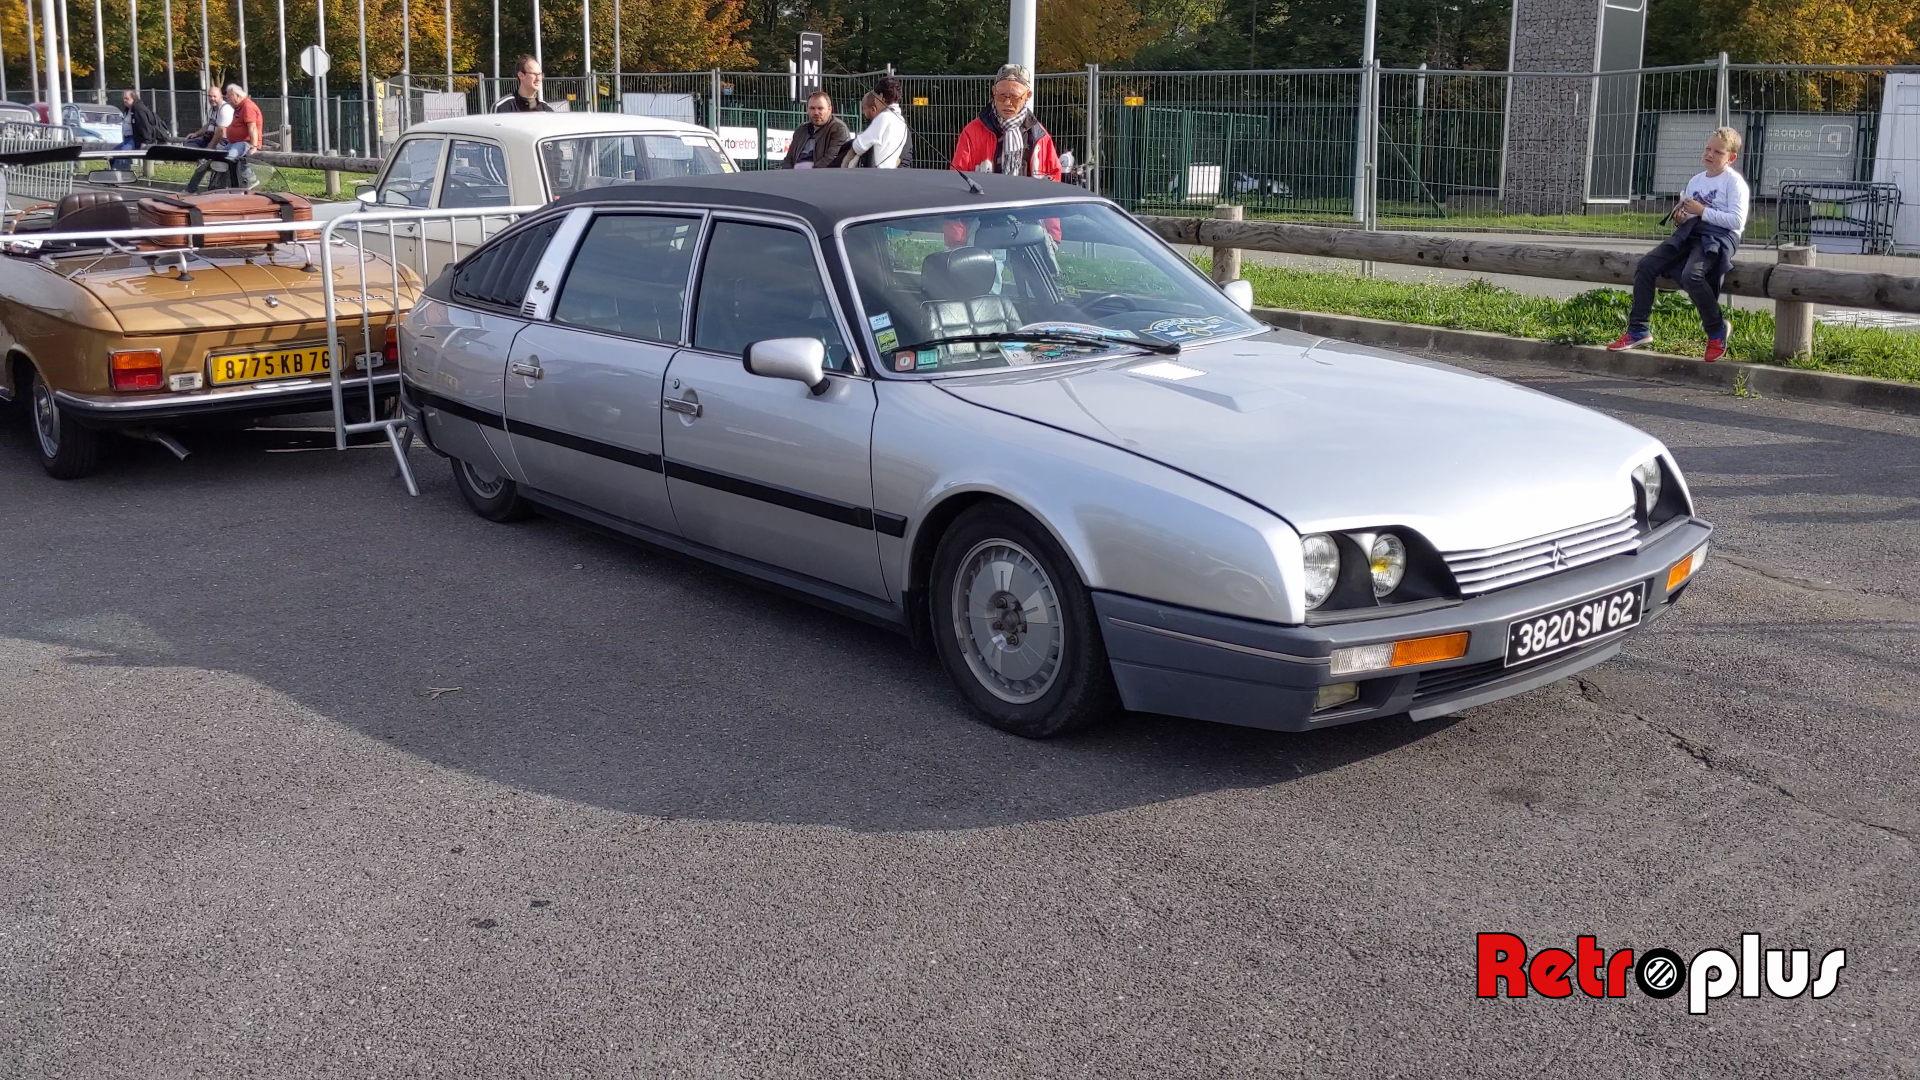 Automedon2019-parkingCitroen46